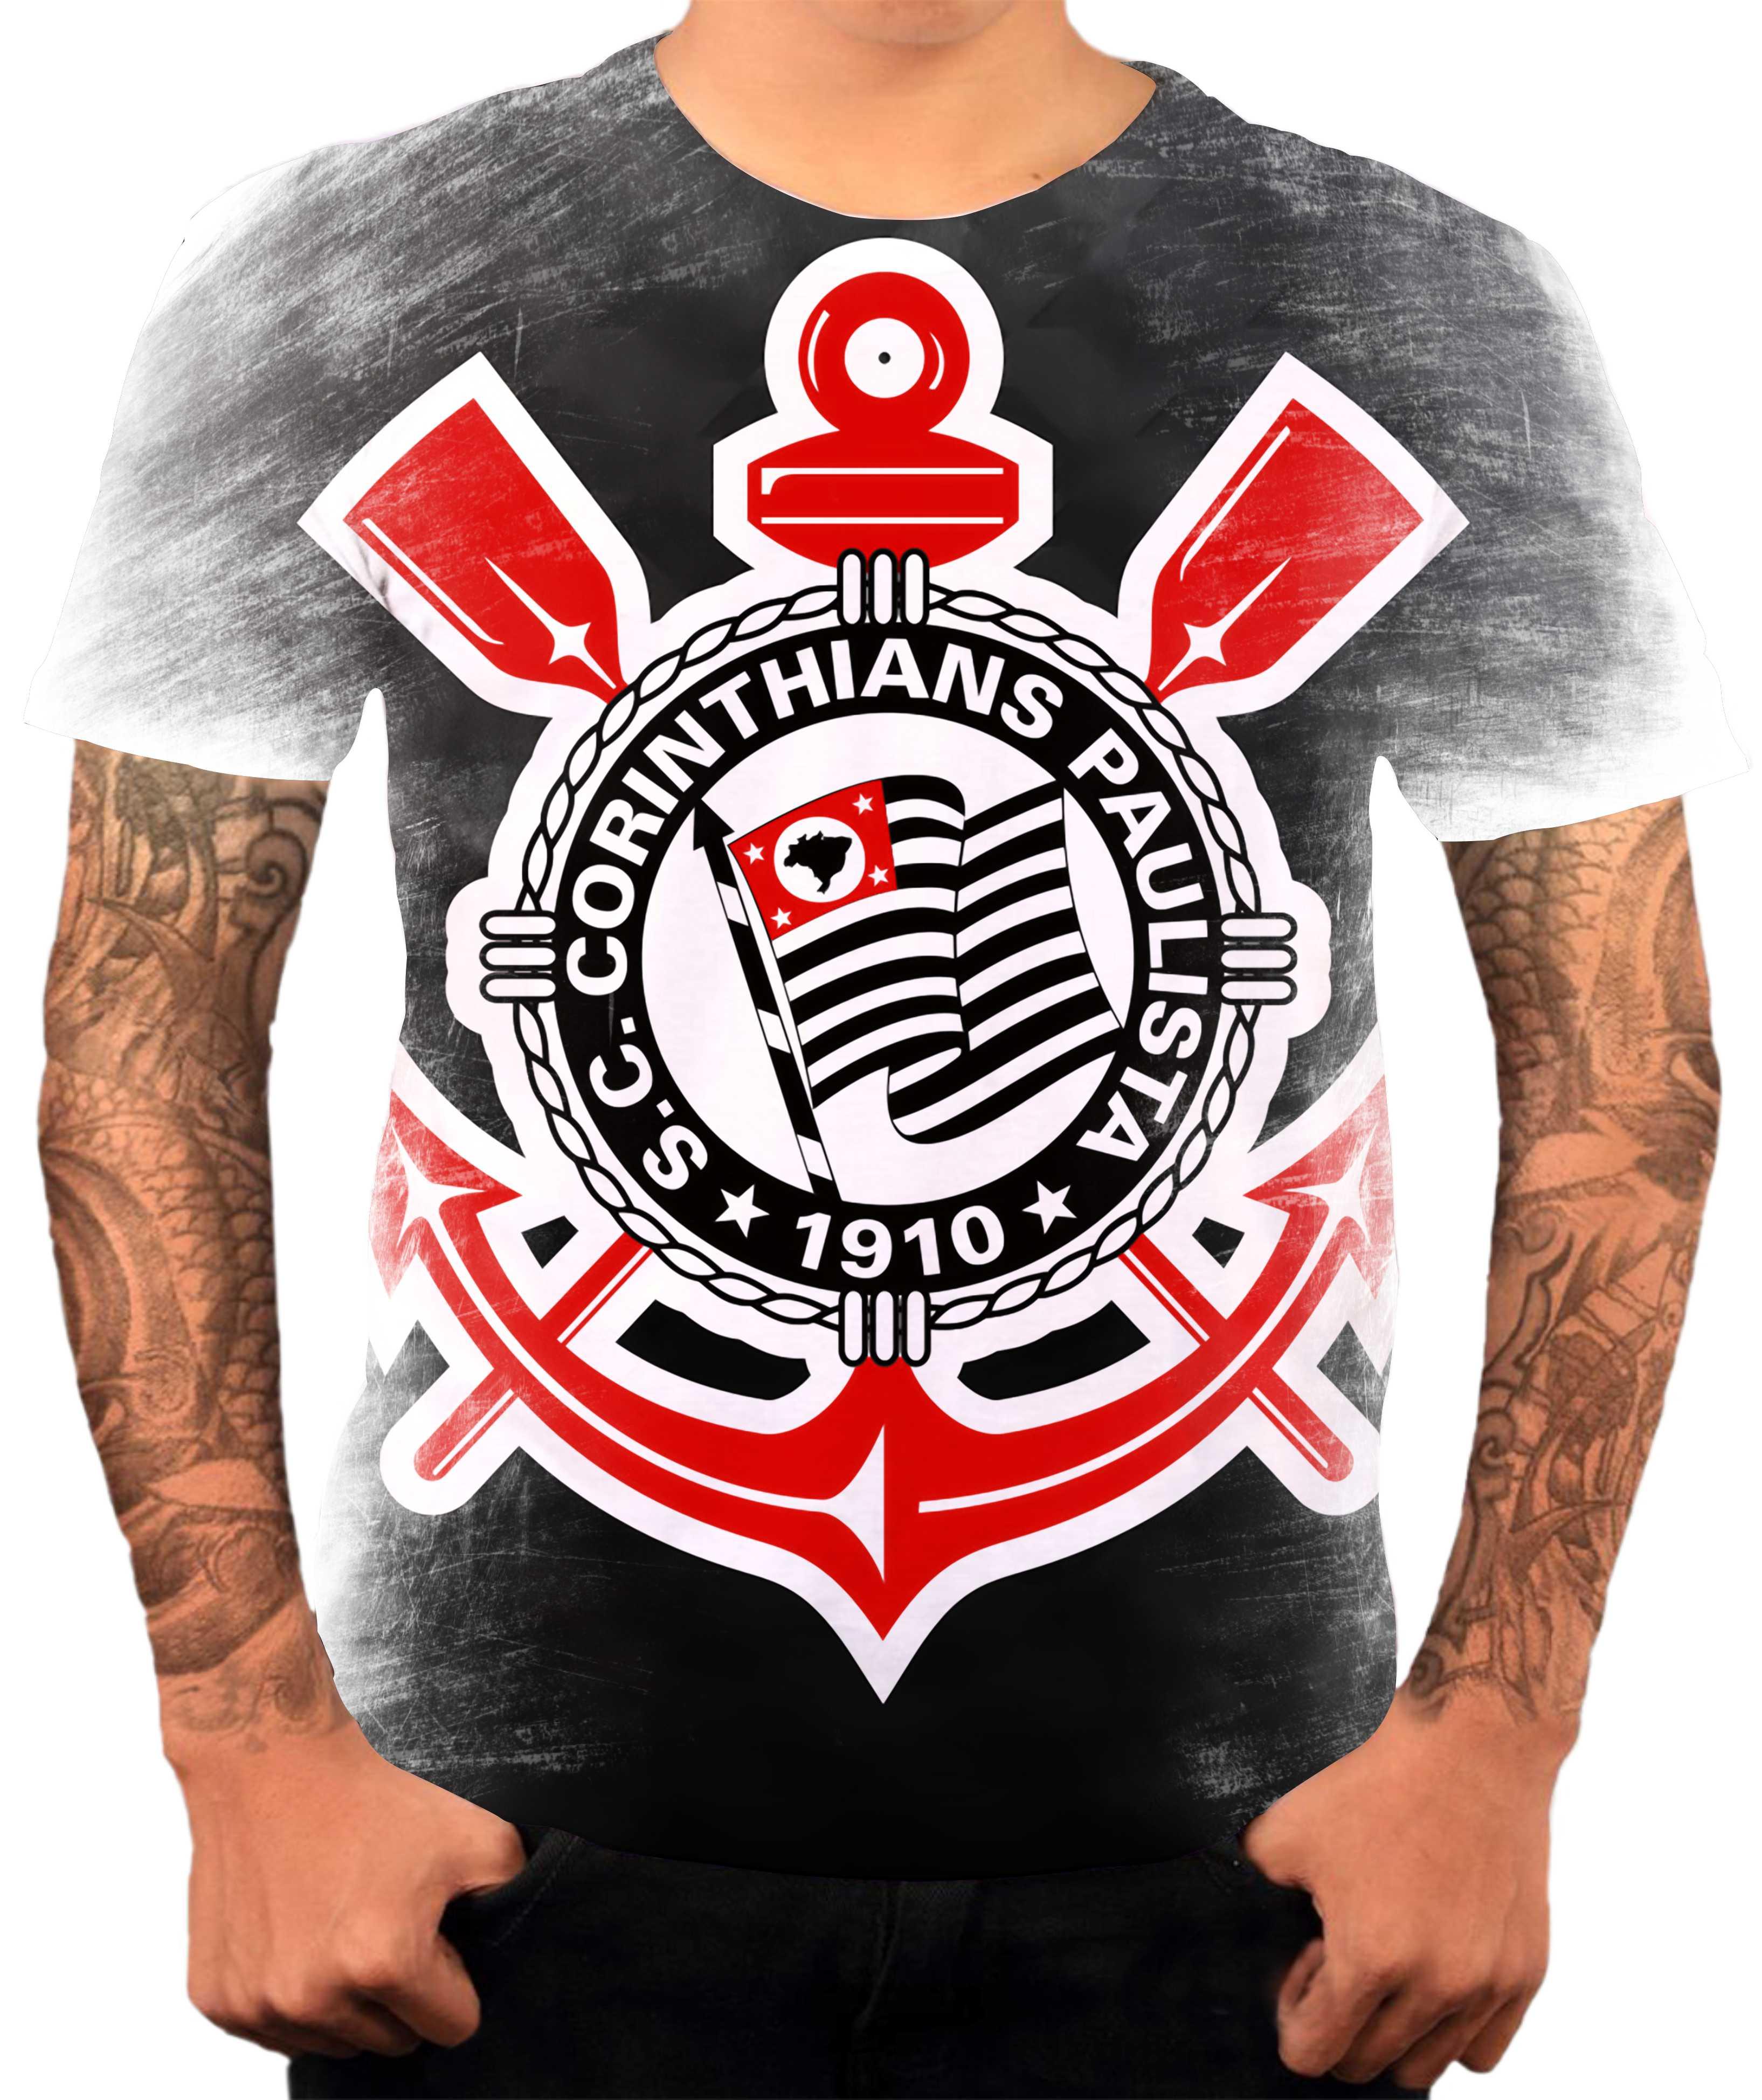 655daecd76 Camisa Camiseta Personalizada Time de Futebol Corinthians 2